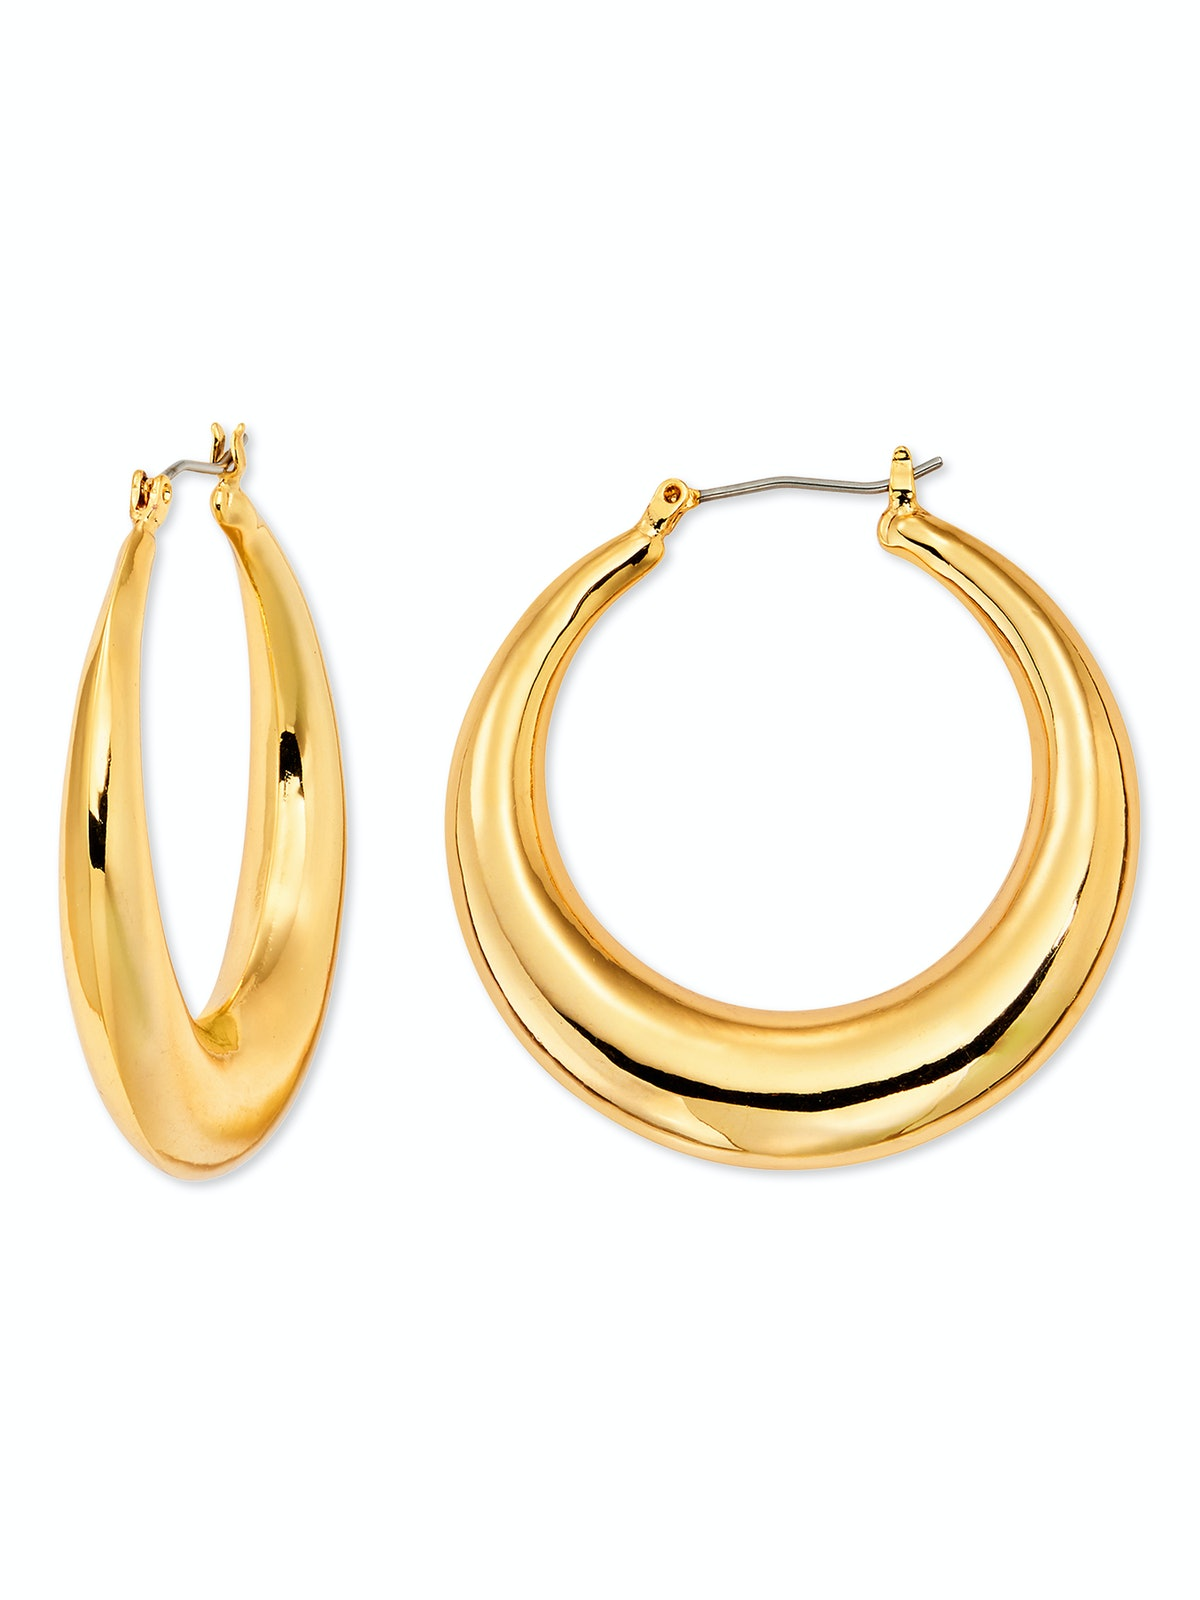 Yellow Gold-Plated Hoop Earrings